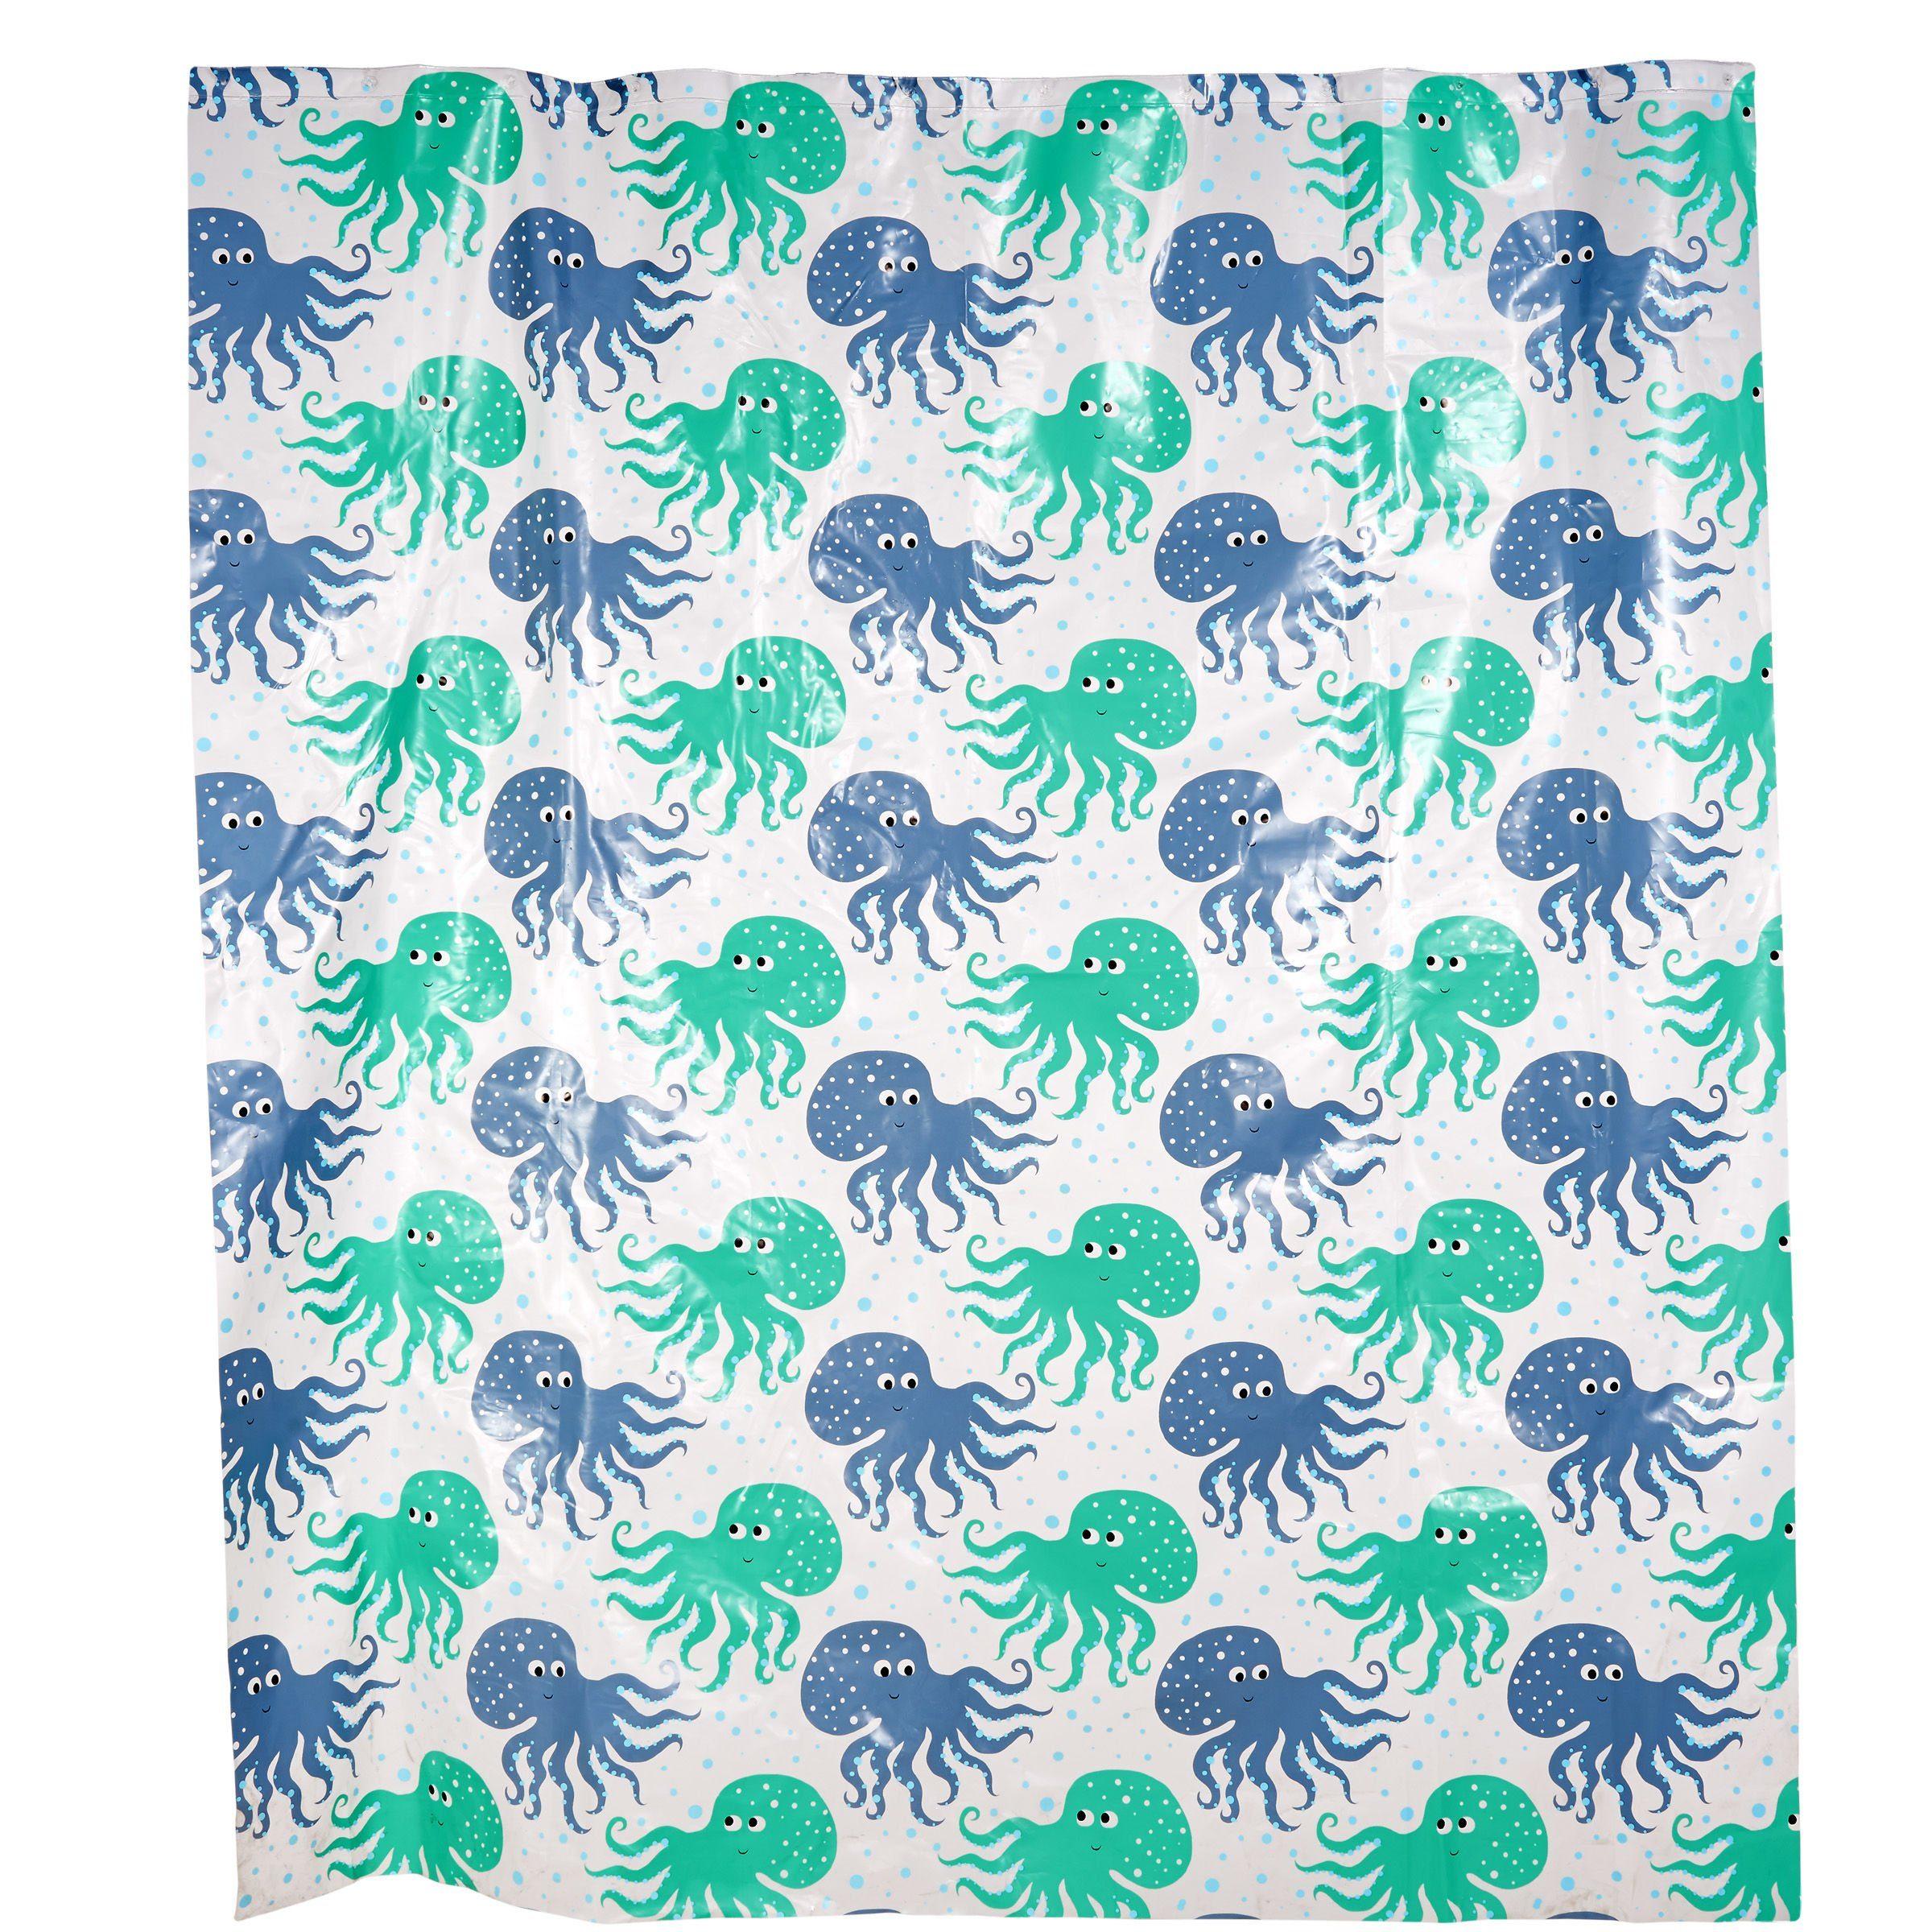 BUTLERS WET WET WET »Duschvorhang Jellyfish«